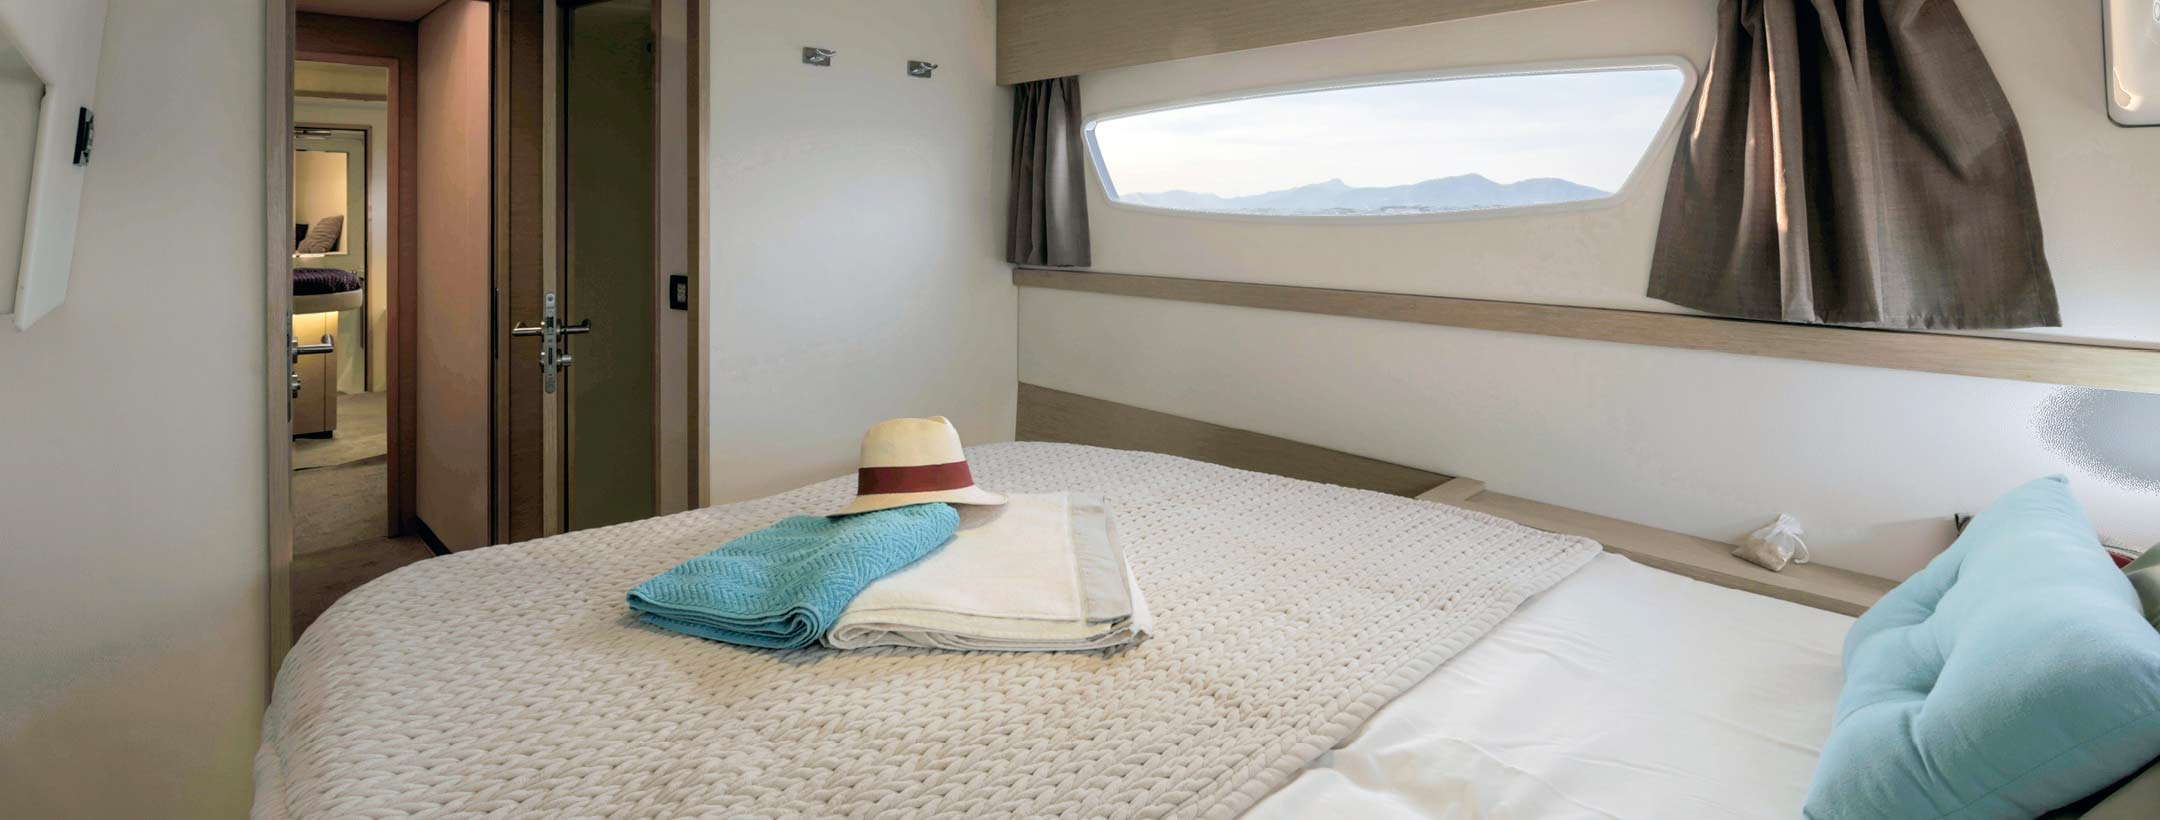 TradeWinds 52 Cruising Class Yacht cabin 2